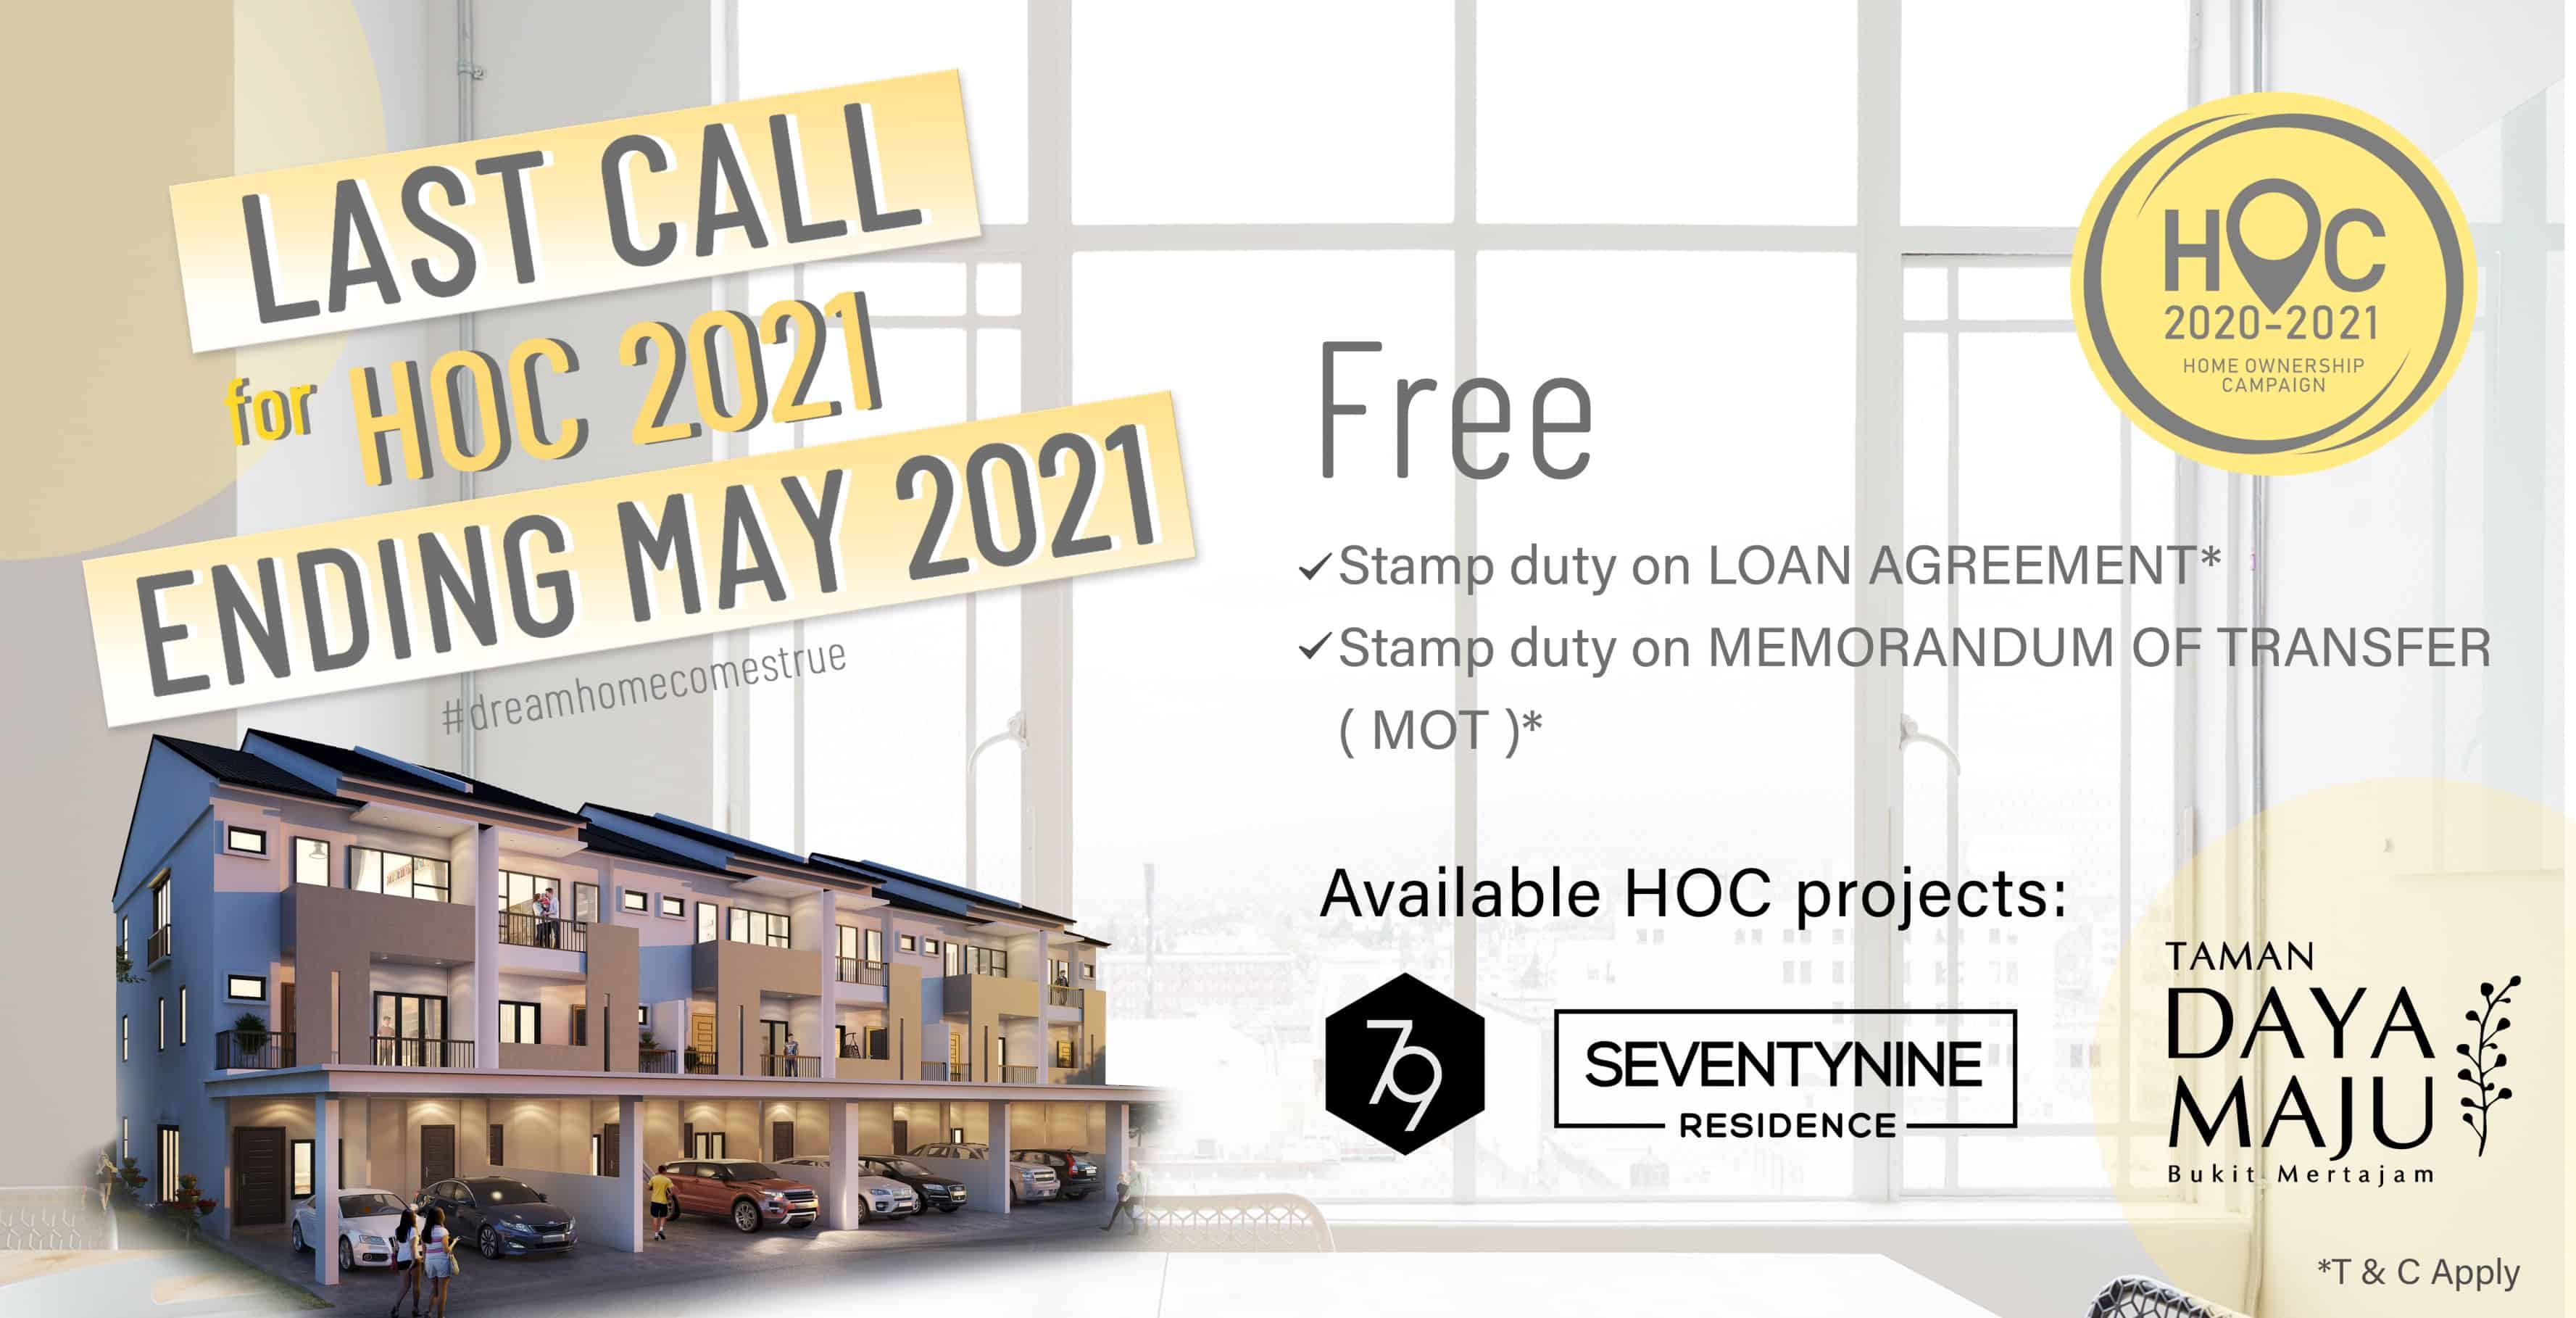 last call for hoc 2021